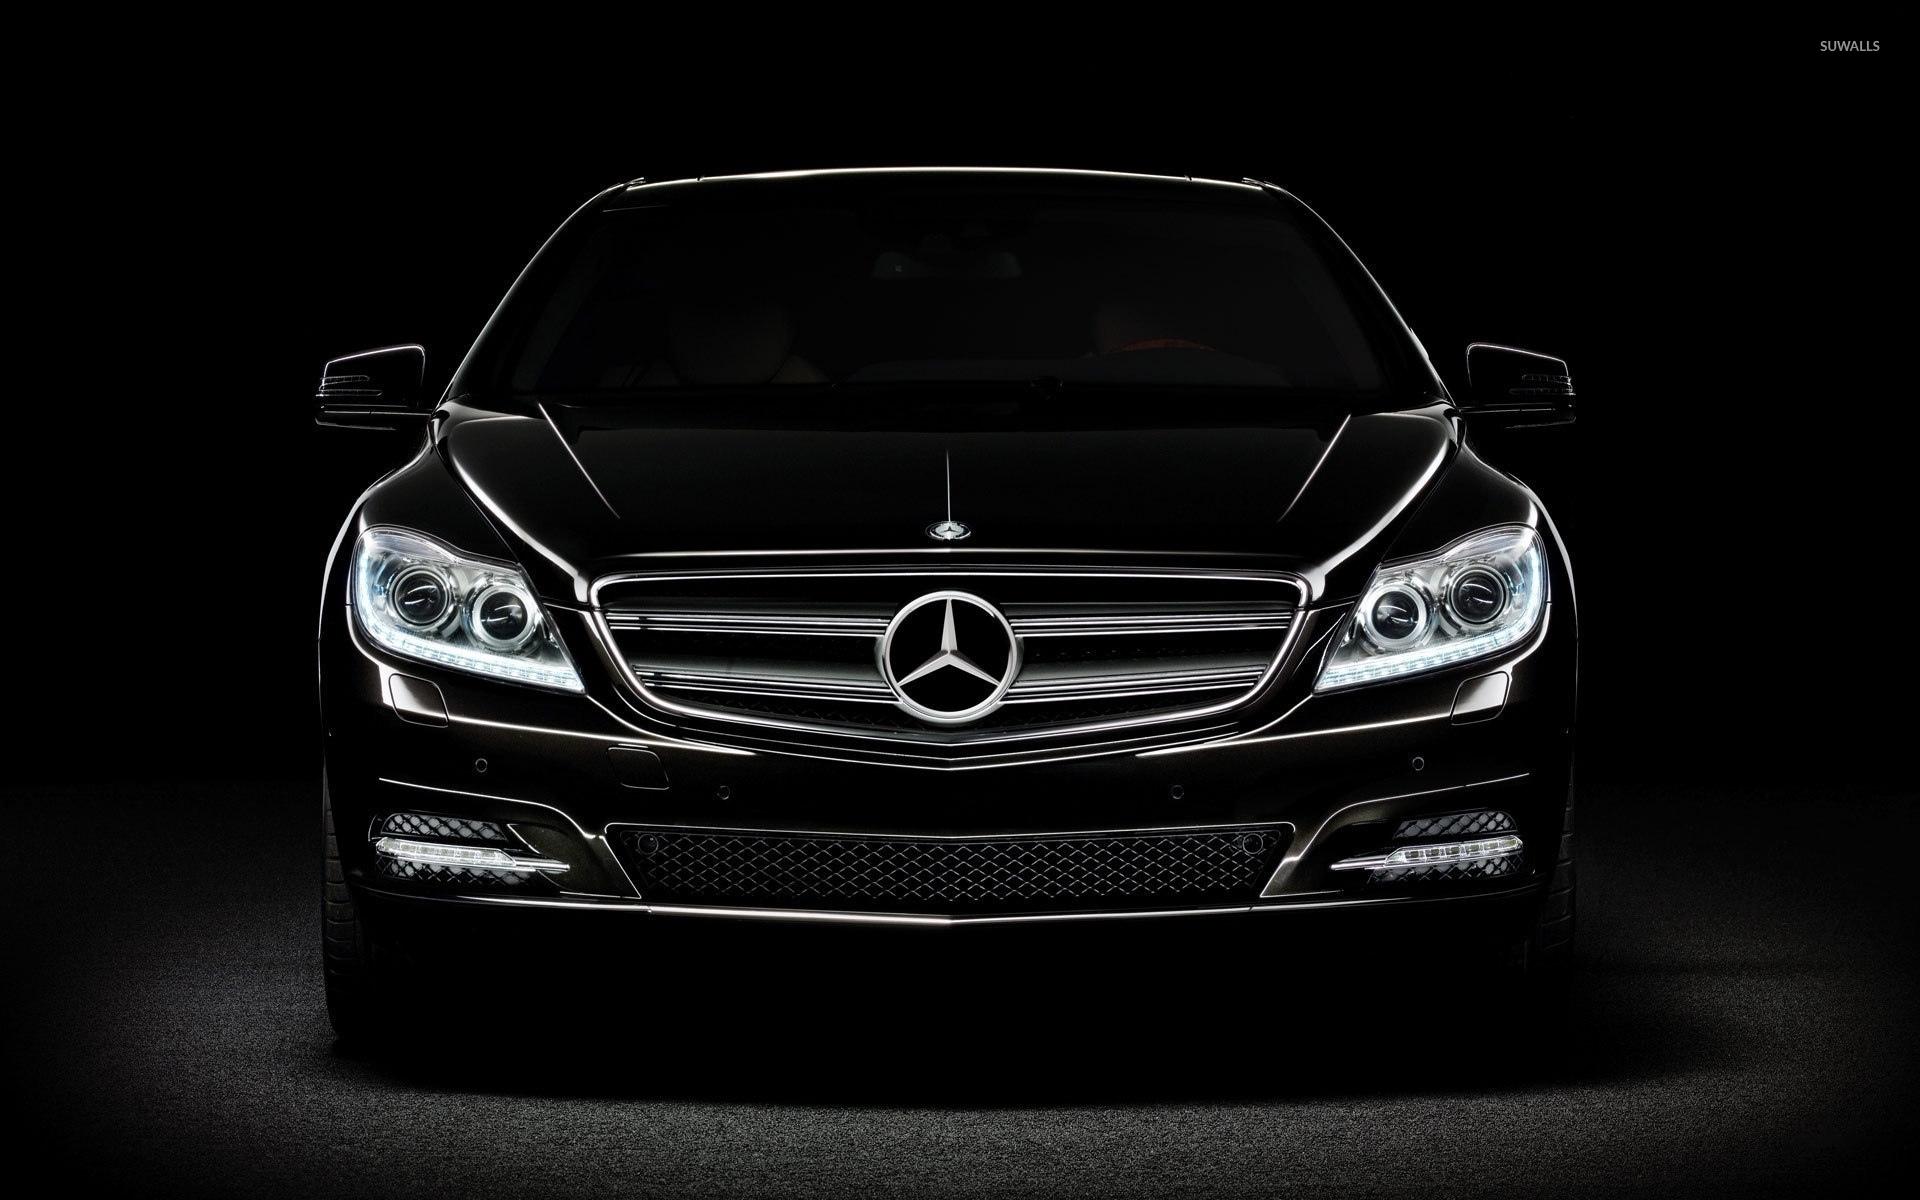 Black Mercedes Benz In The Darkness Wallpaper